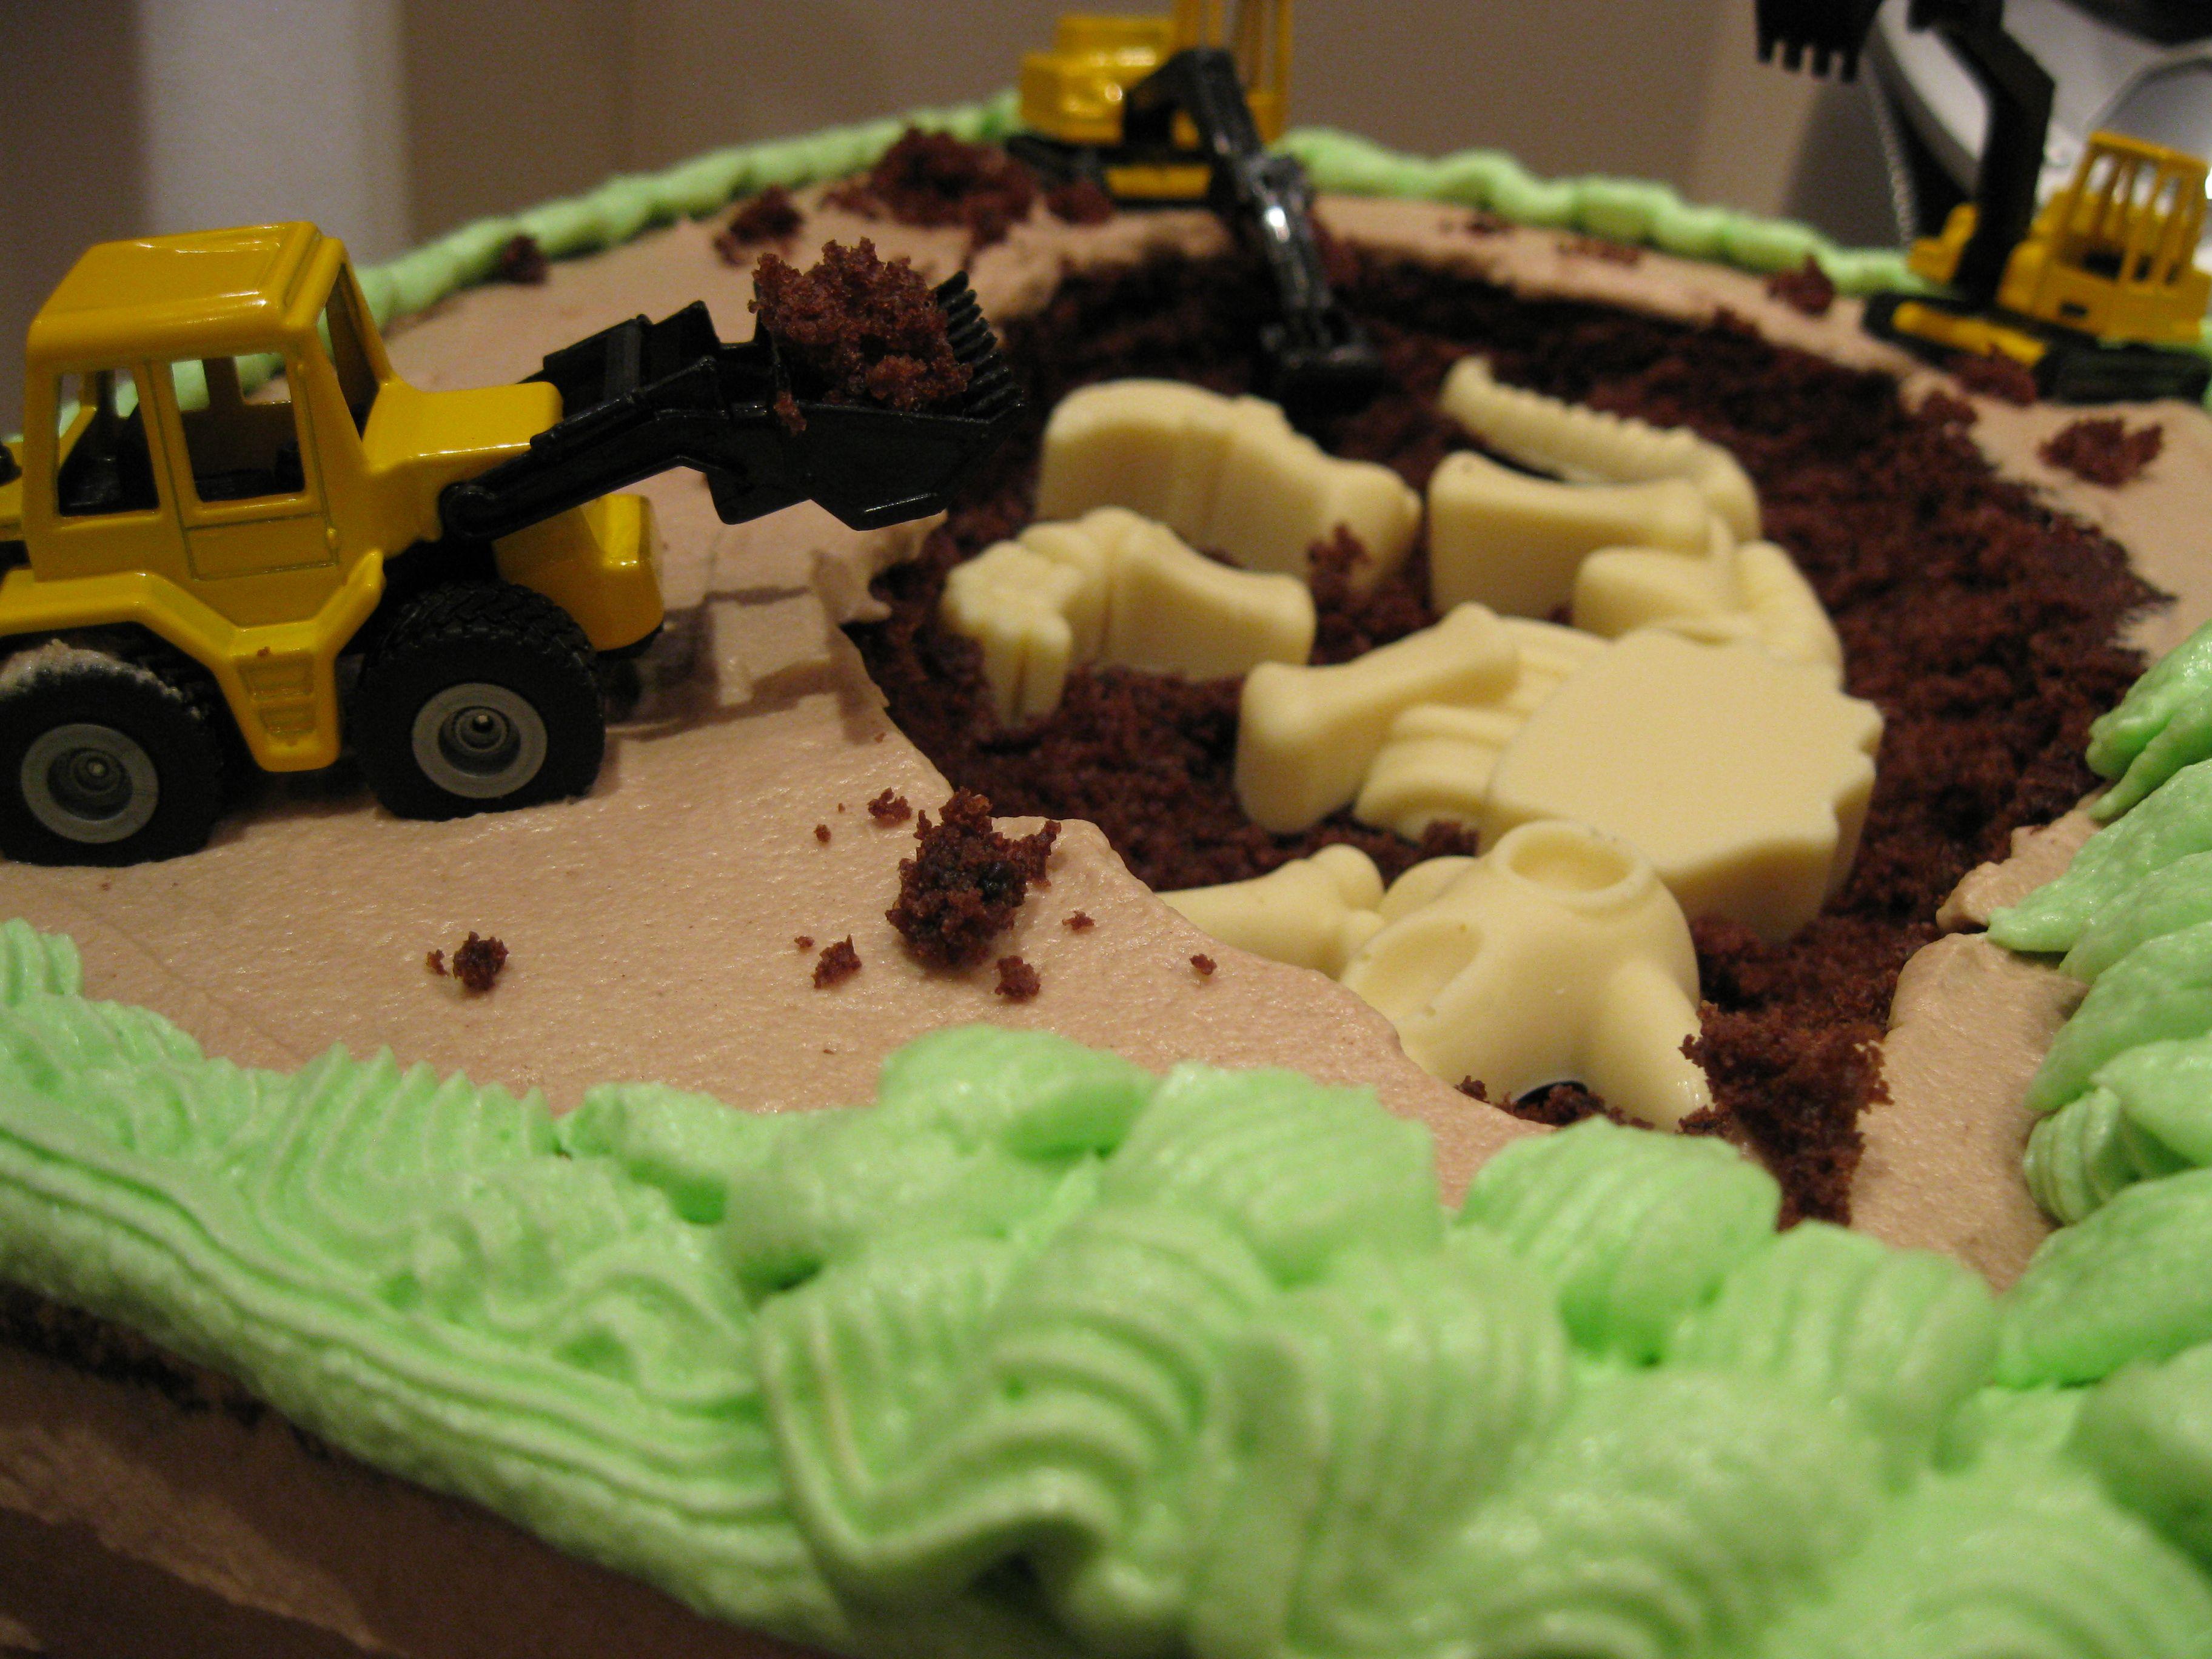 theme Motive fancy cake buttercream Birthday cake Dino Dinosaur Geburtstagskuchen Buttercreme Dinosaurier Kuchen Torte